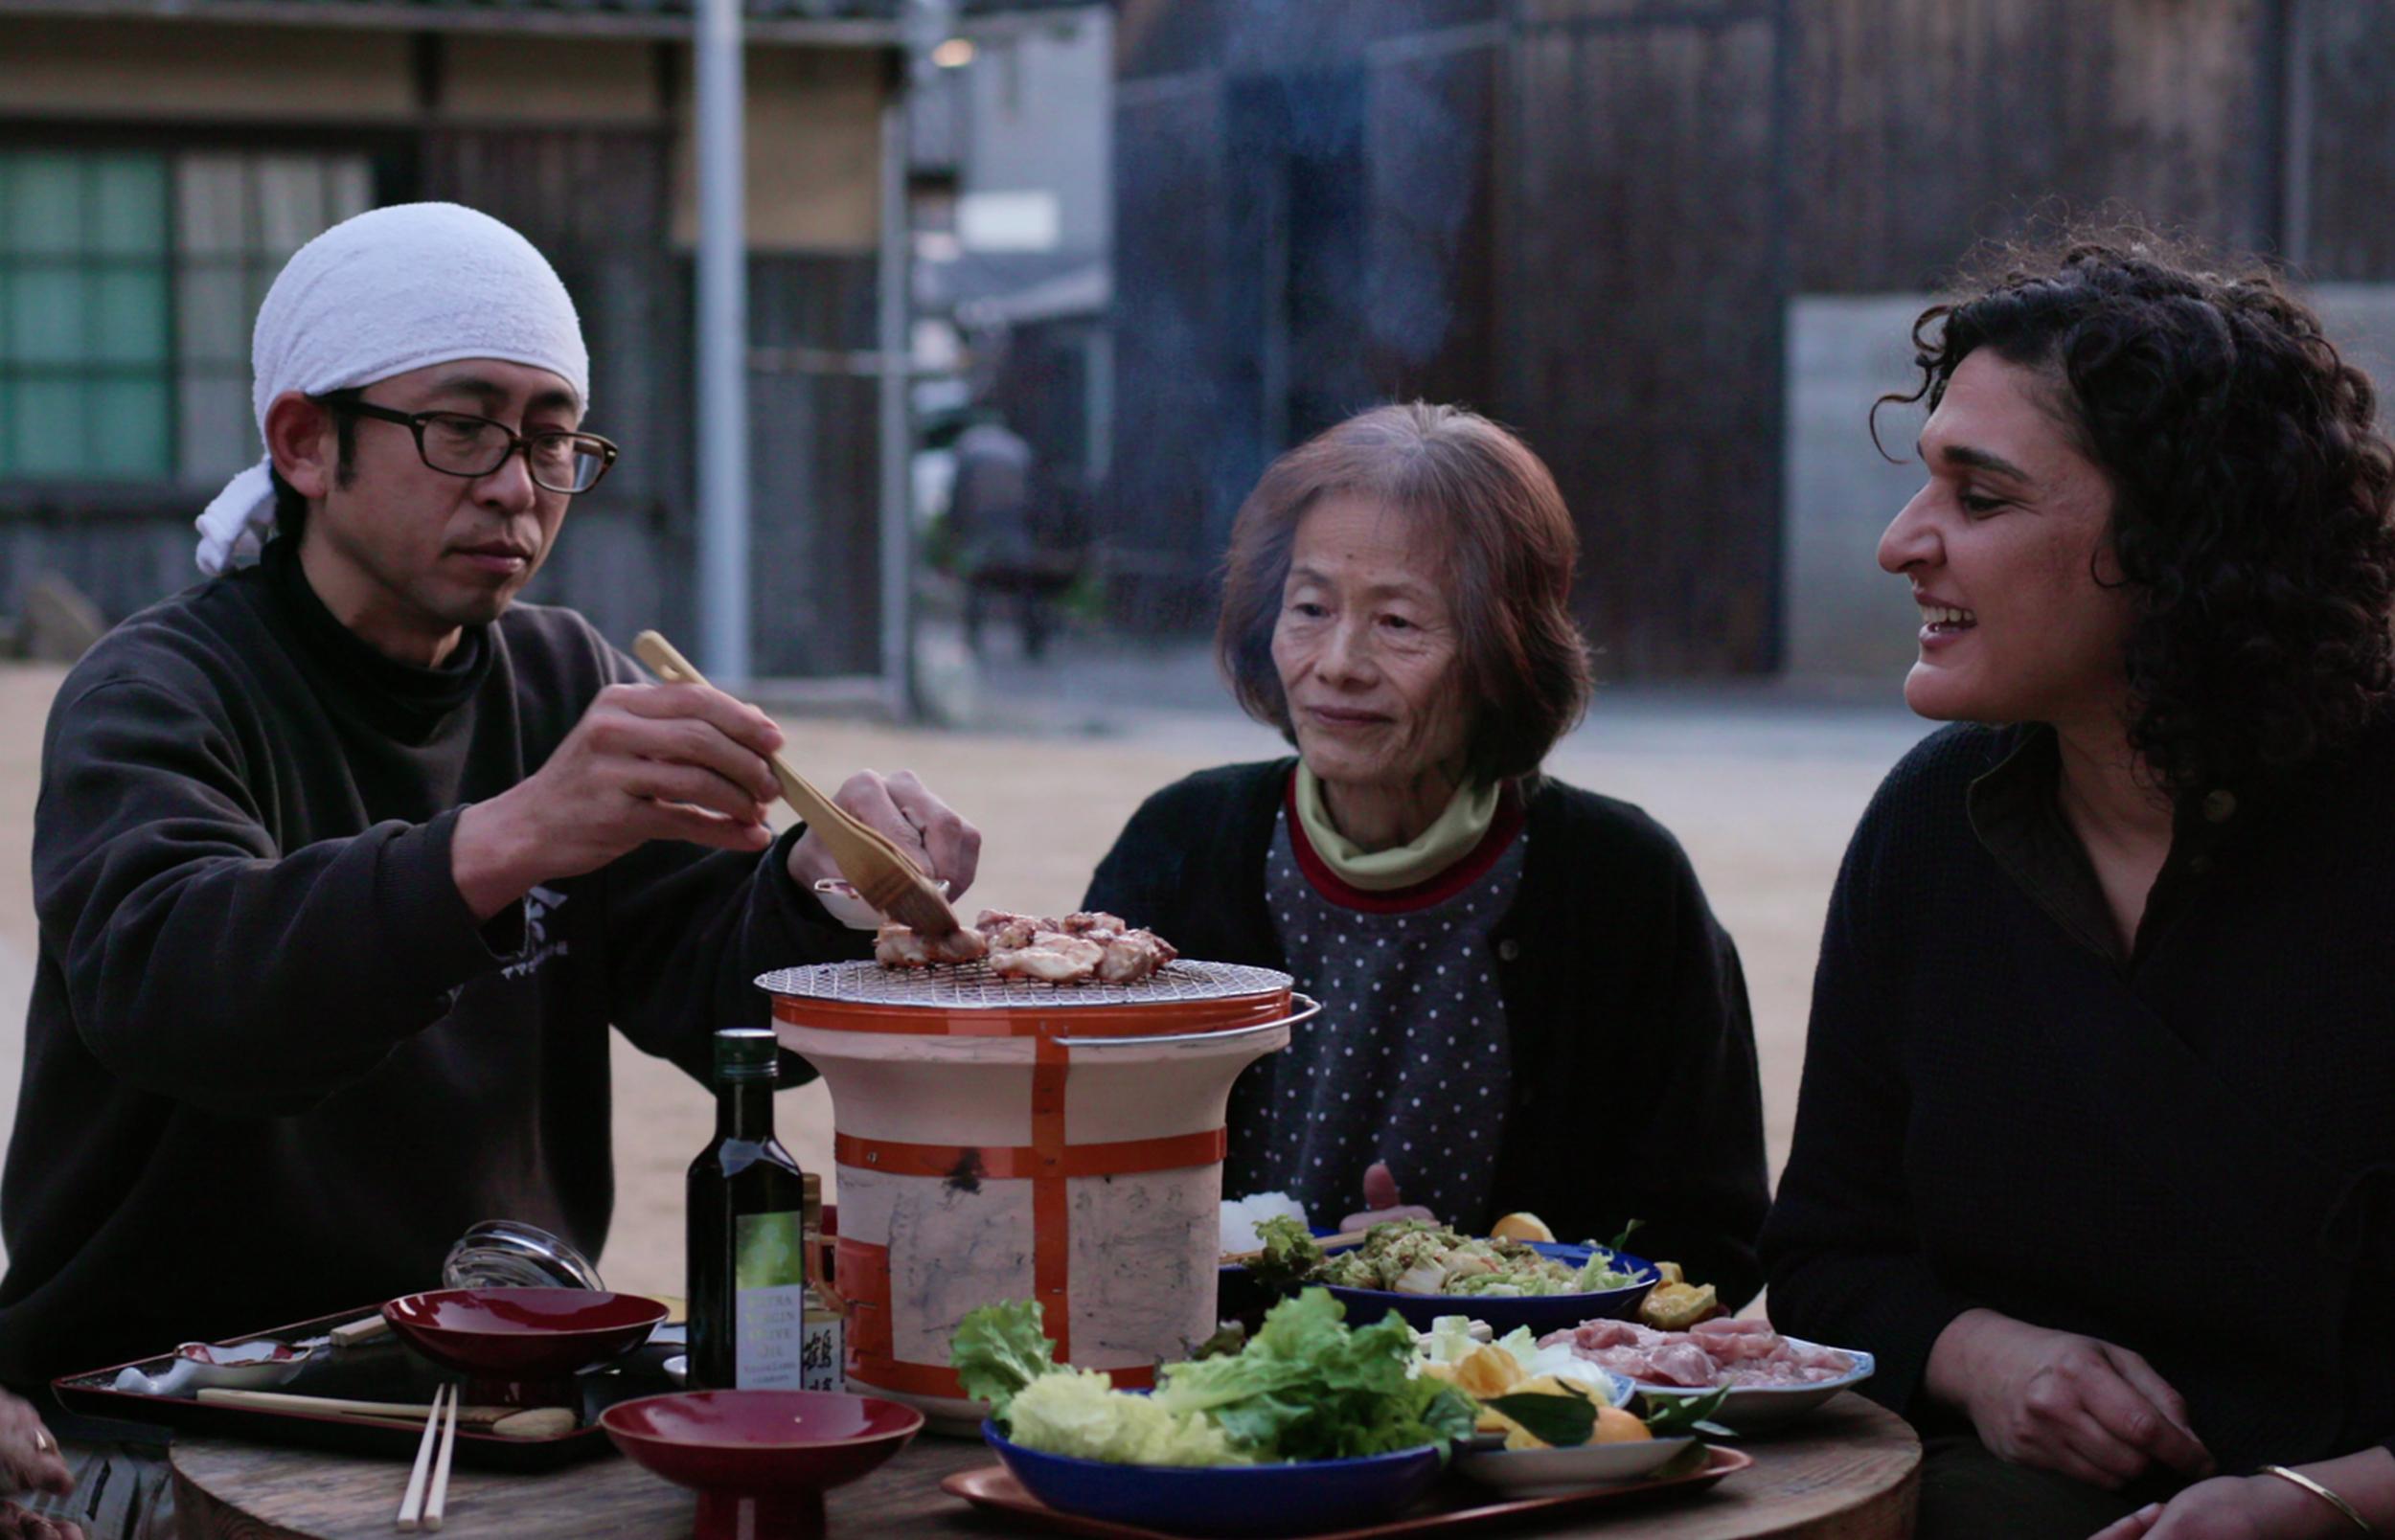 'Salt, Fat, Acid, Heat' Recap: Samin Explores the Wide World of Salt in Japan